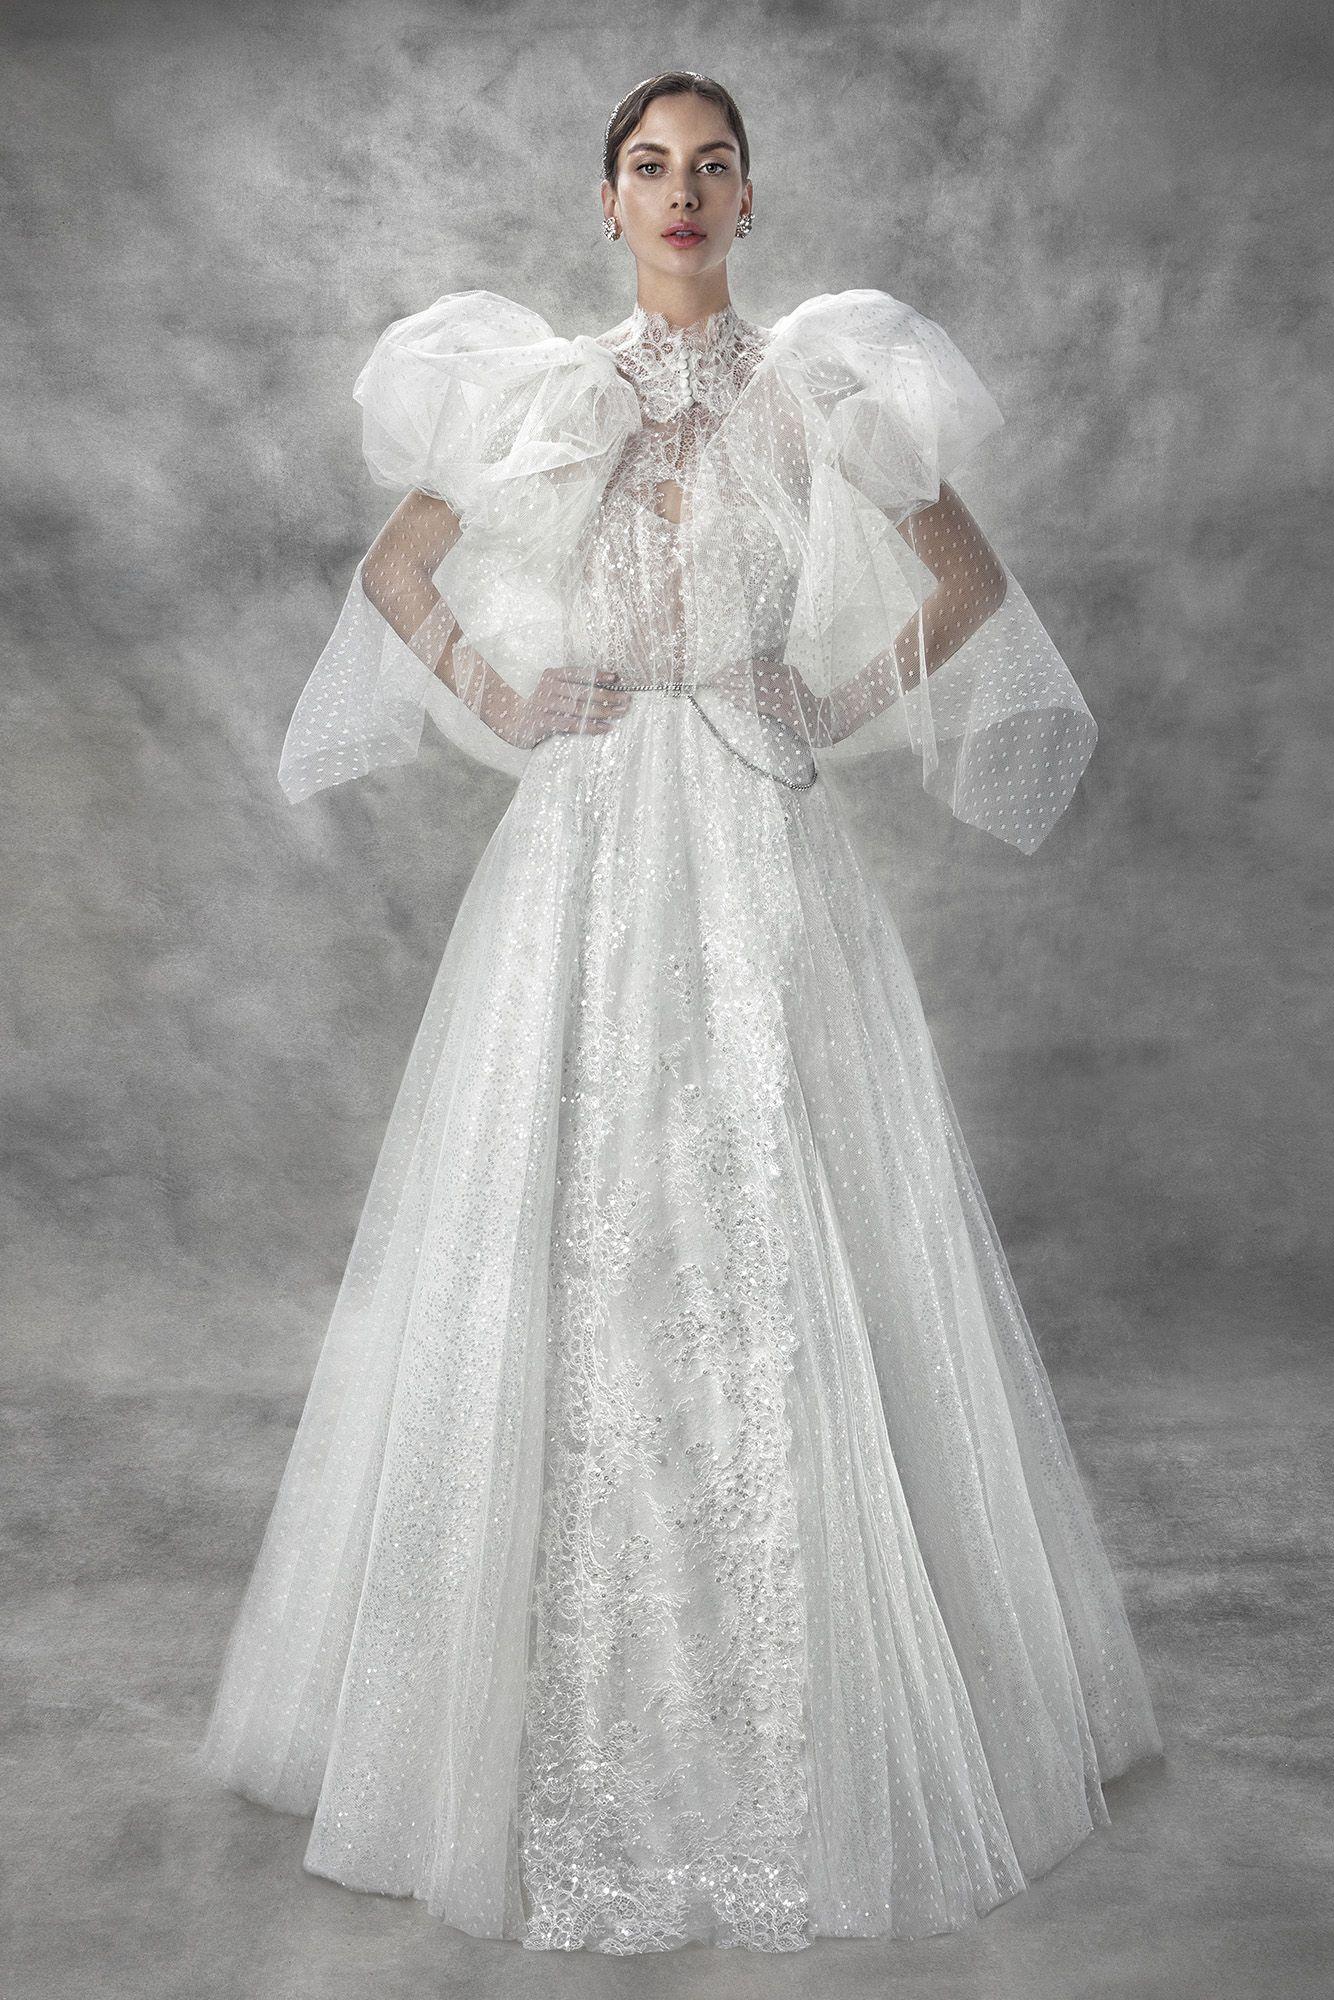 a95d67f241f66 Victoria KyriaKides Bridal Spring 2020 | FAV Wedding, 2020 ...